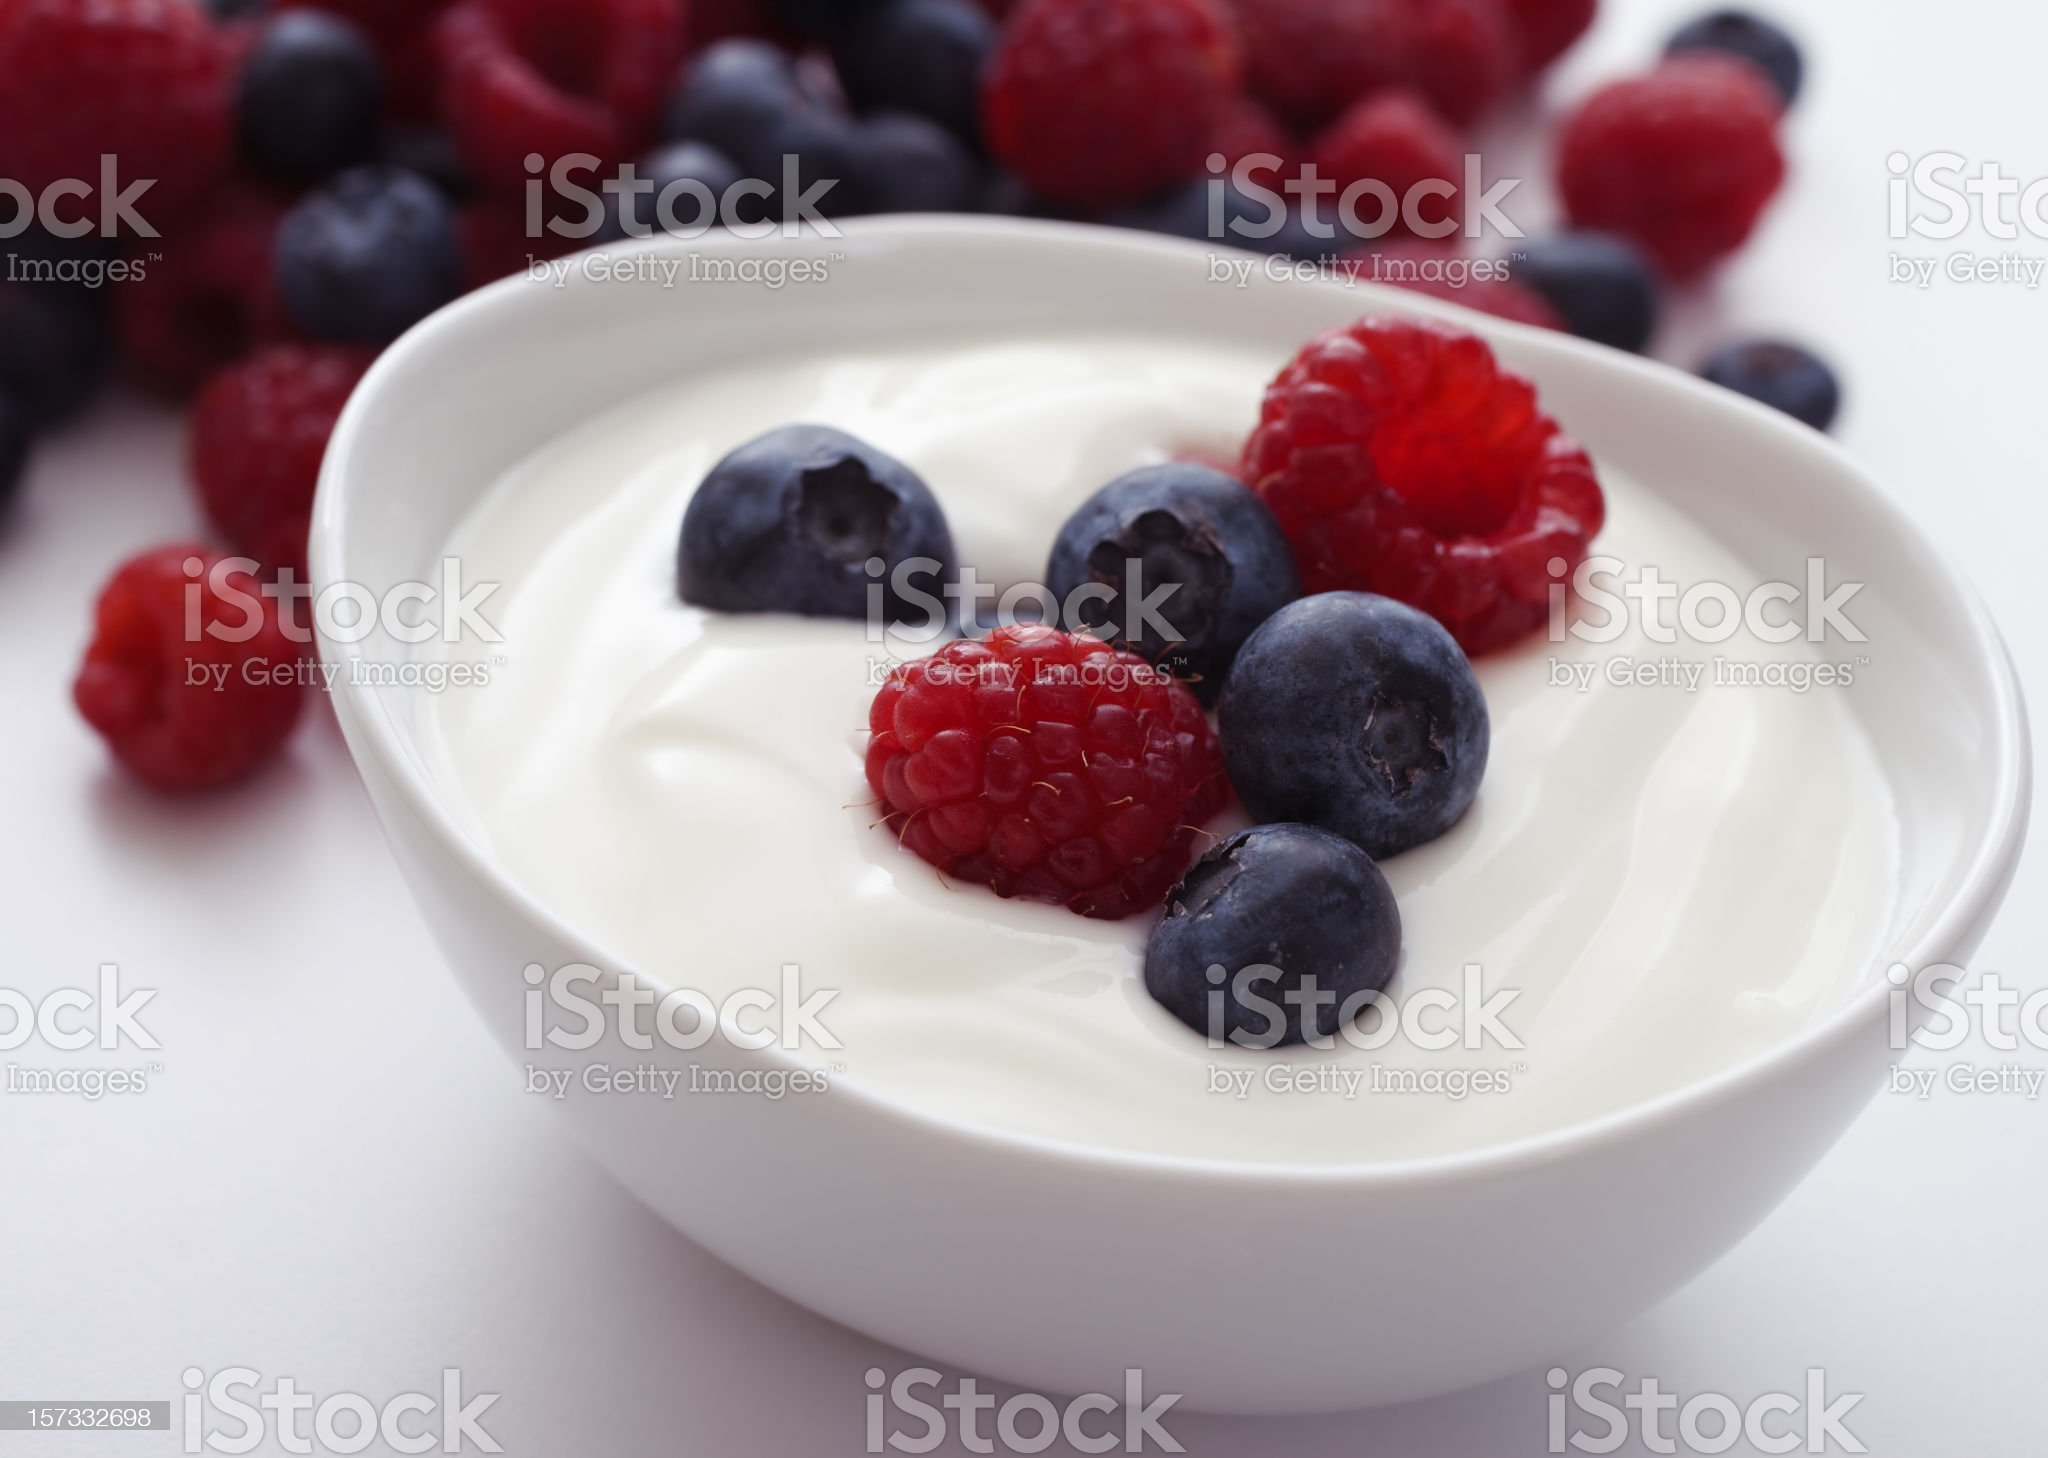 Yogurt and fruit royalty-free stock photo